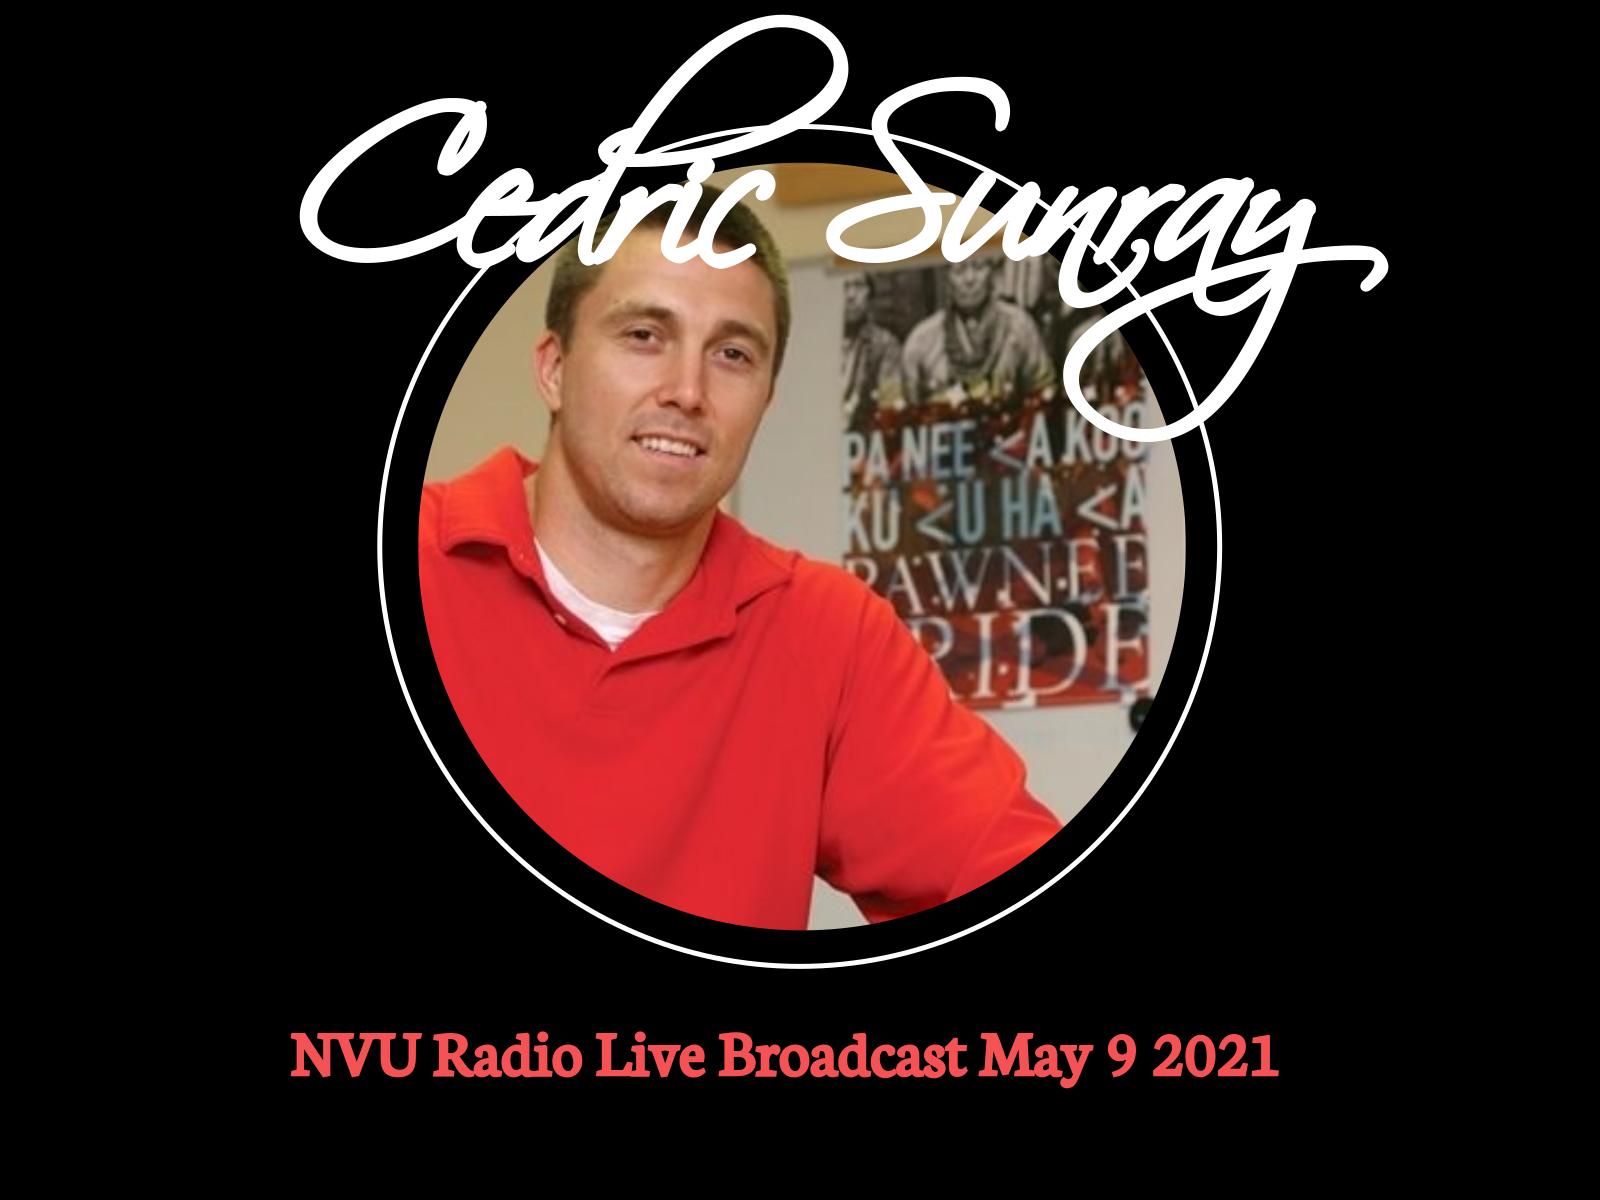 Cedric Sunray LIVE NVU Radio